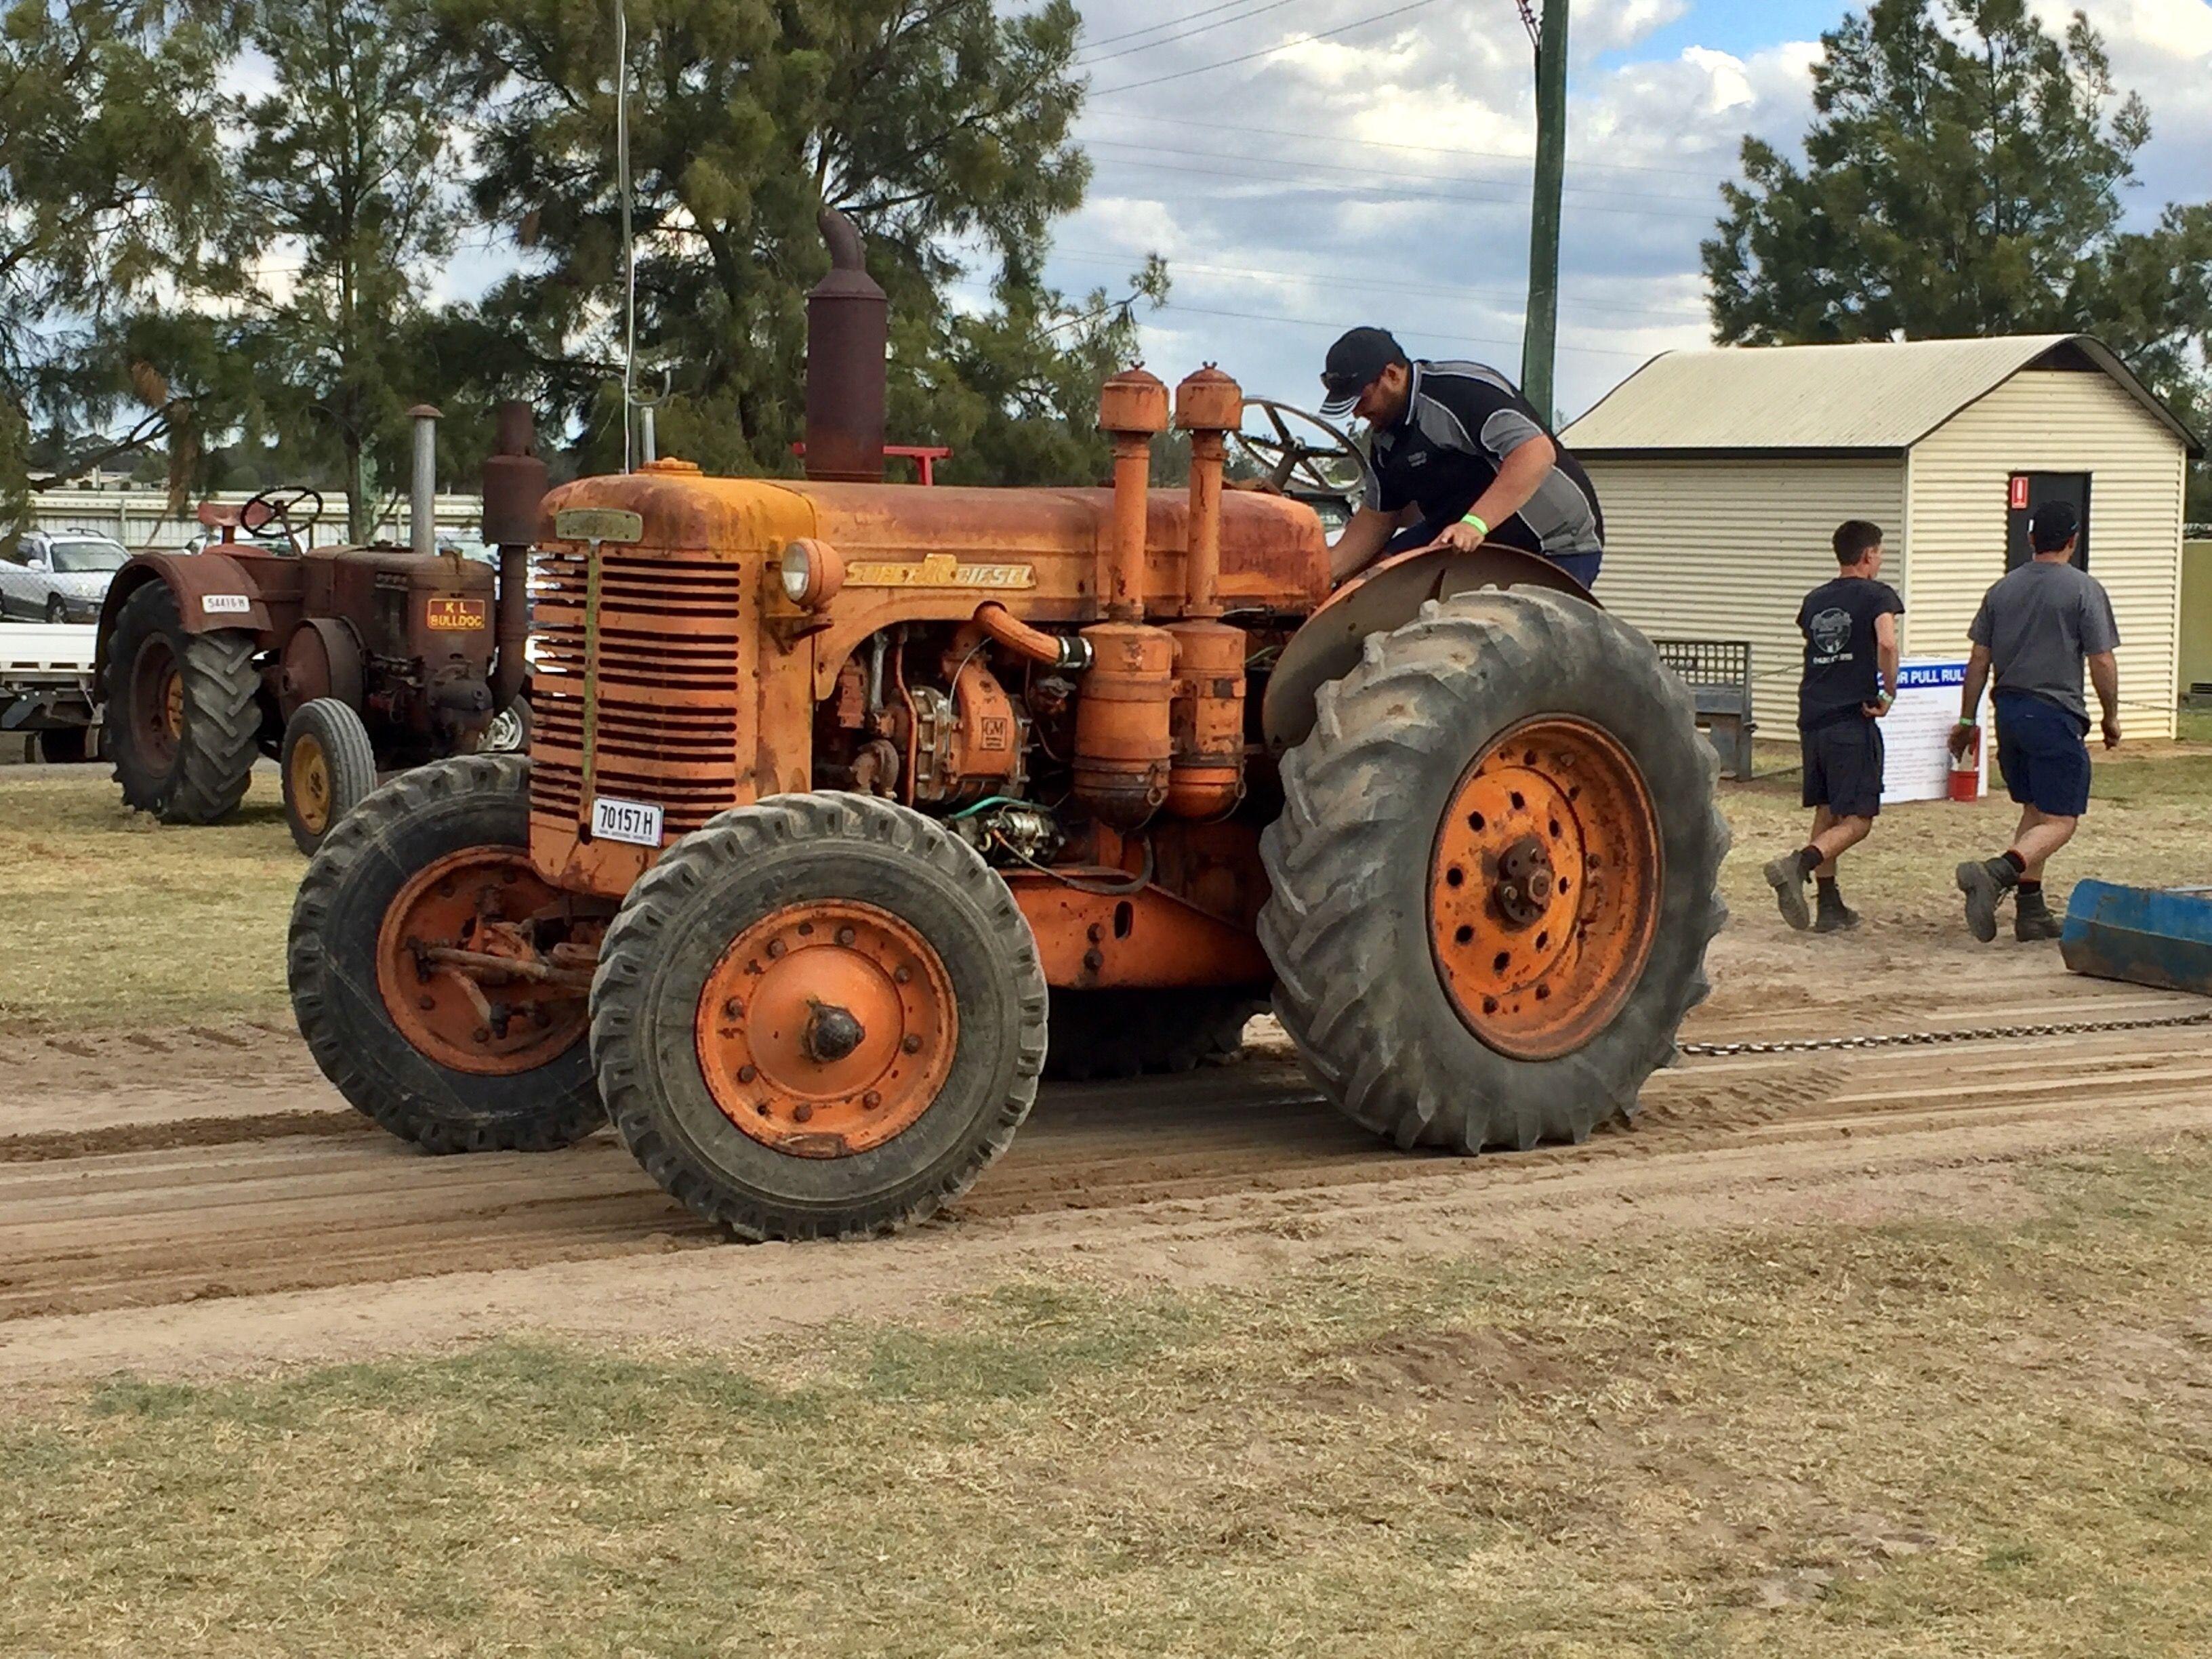 Pin by John Shepherd on tractors | Pinterest | Tractor